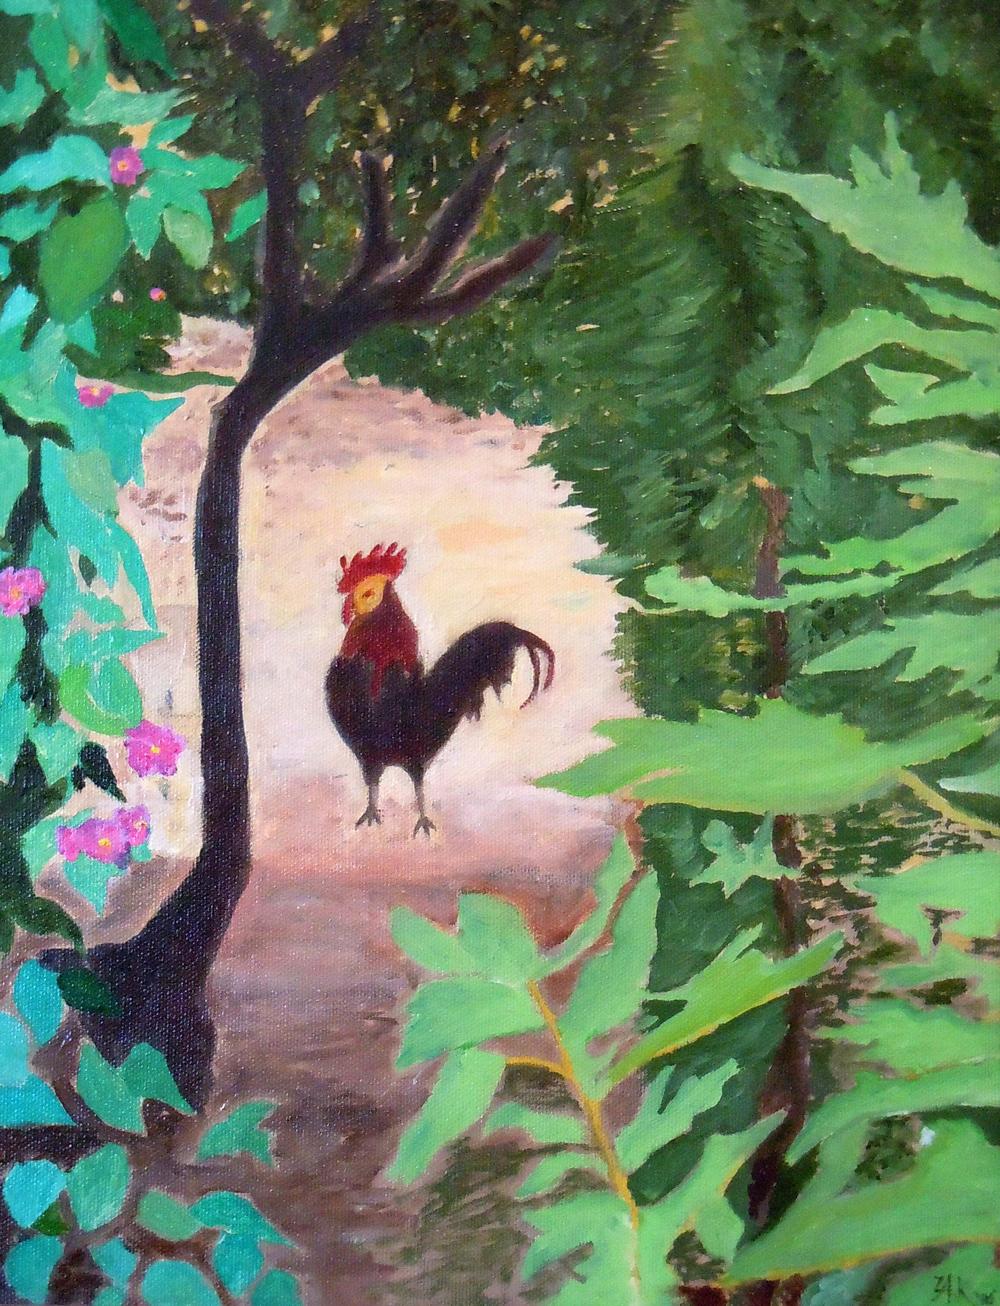 12. Rooster in the Clot.DSCN2011 copy.jpg